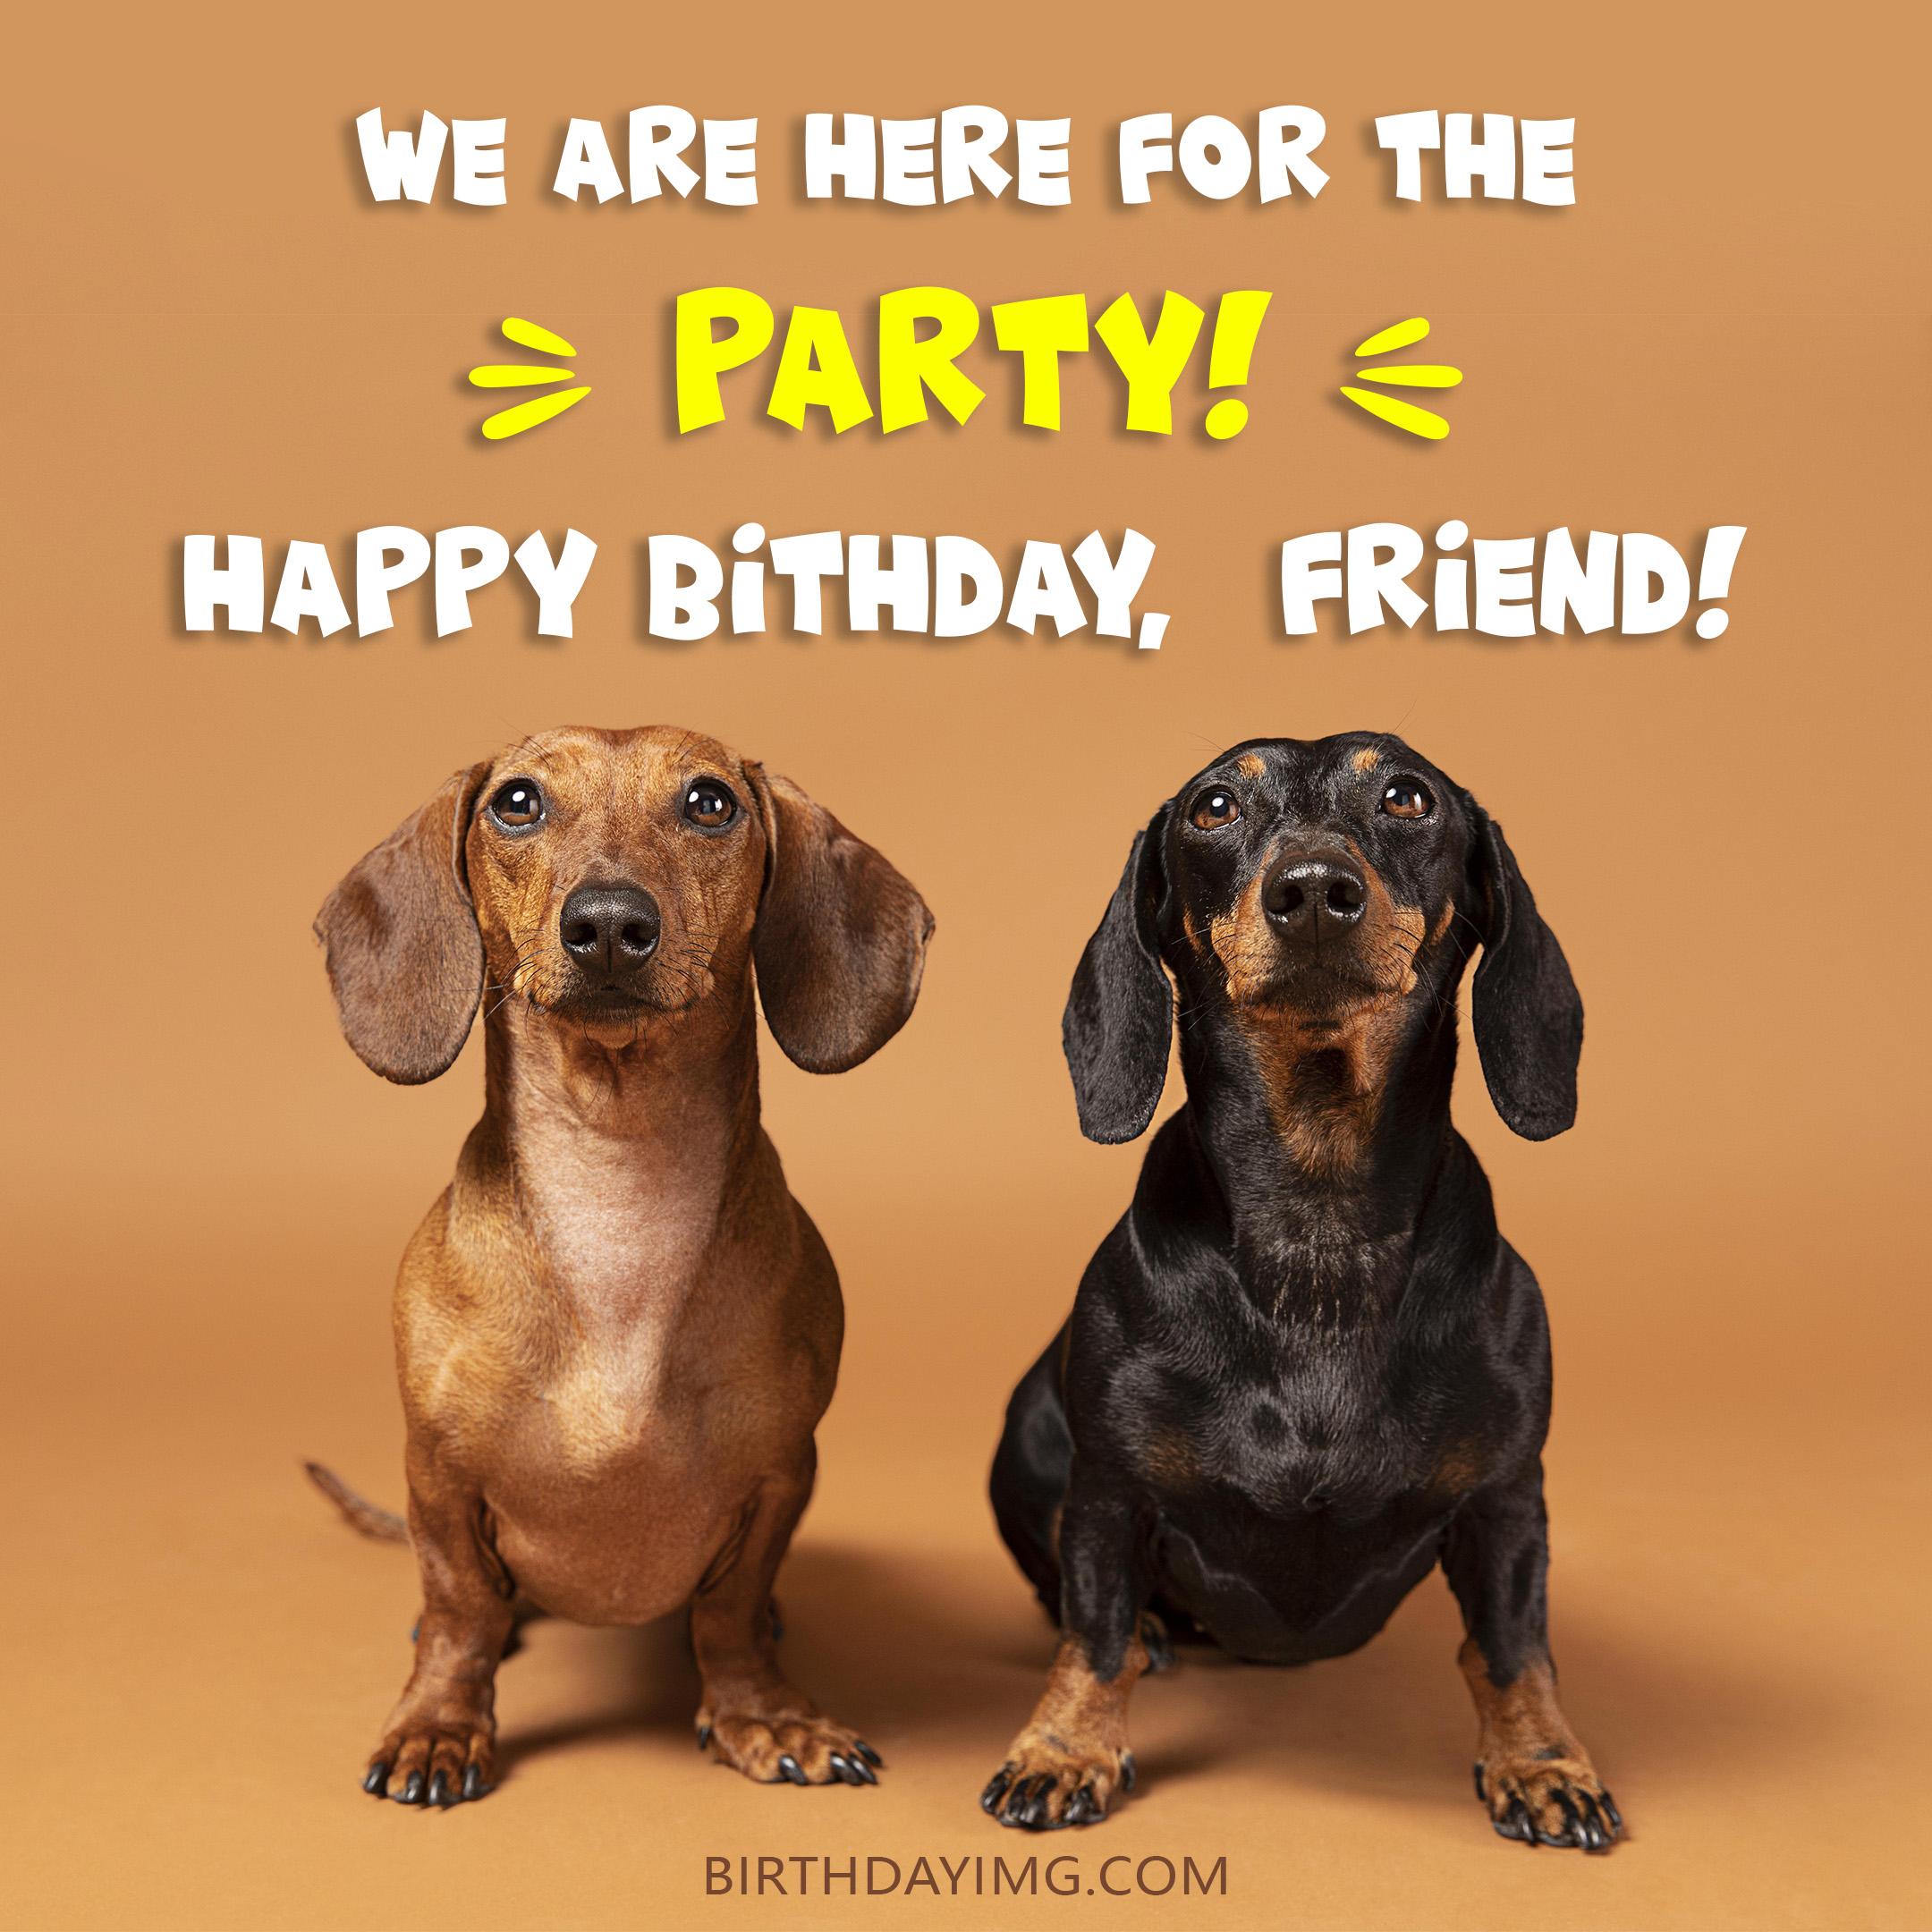 Free Friend Happy Birthday Image With Funny Dachshunds - birthdayimg.com